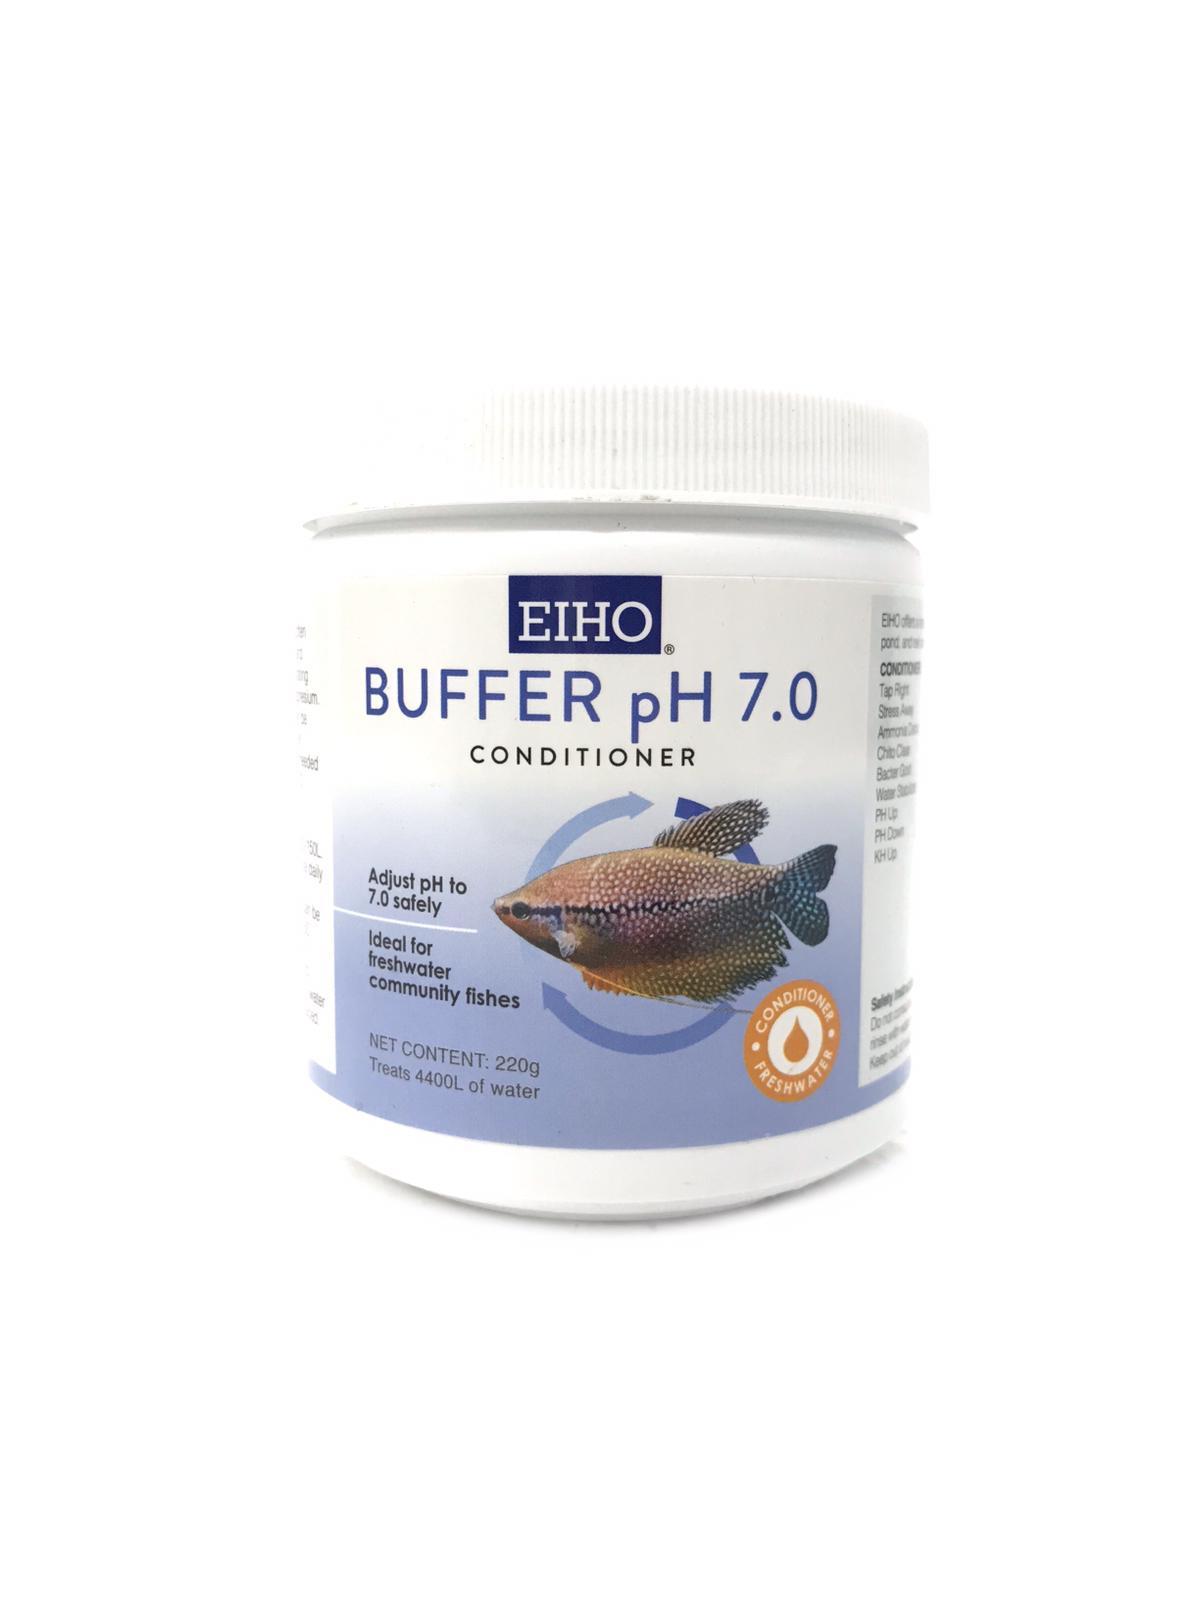 Eiho Buffer pH 7.0